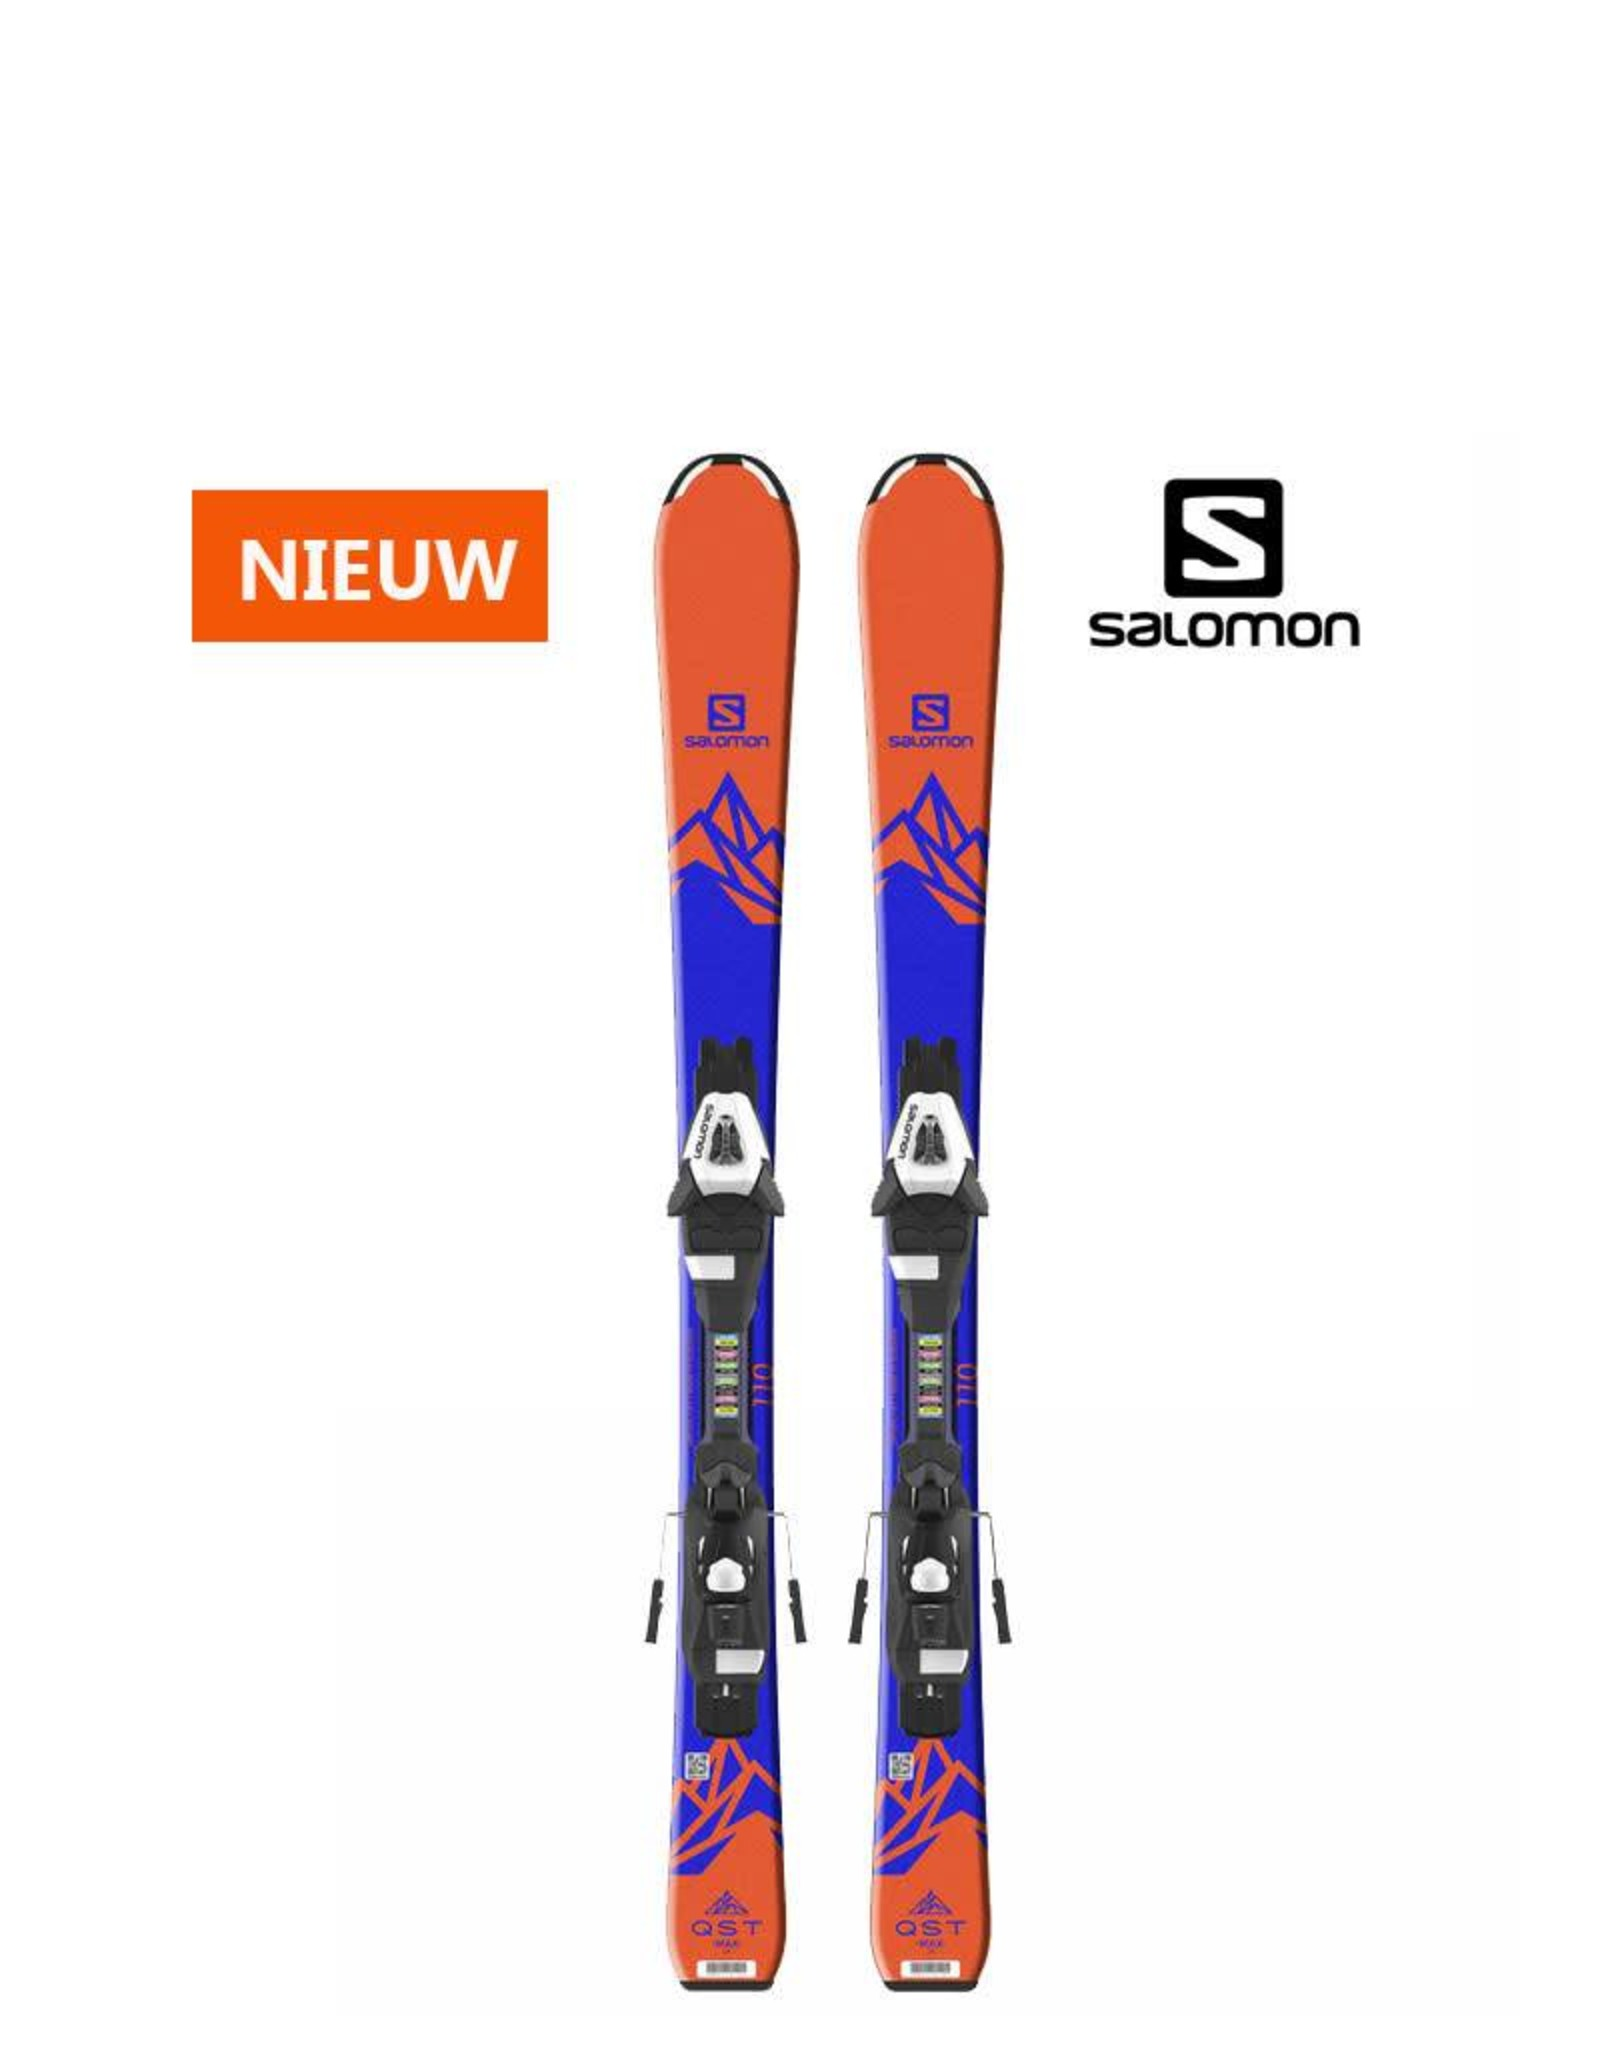 SALOMON Salomon E QST MAX Jr S Oranje/blauw Ski's NIEUW